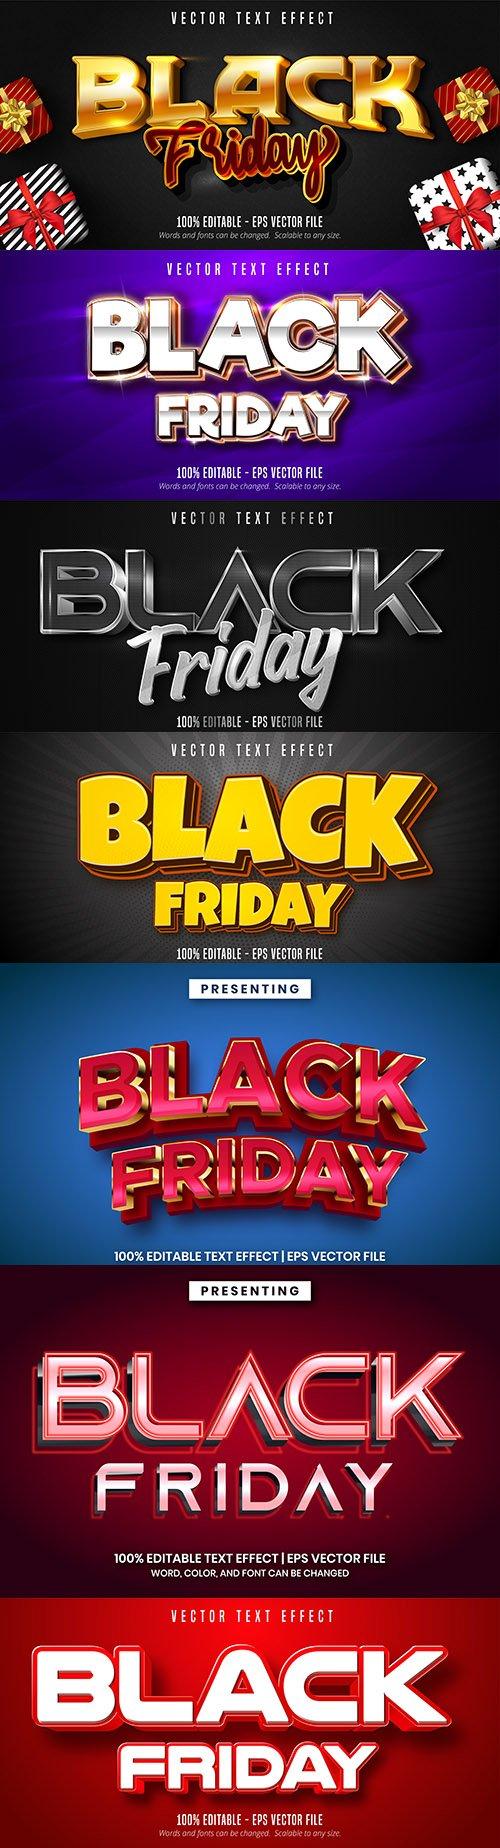 Black Friday Editable font effect text illustration design